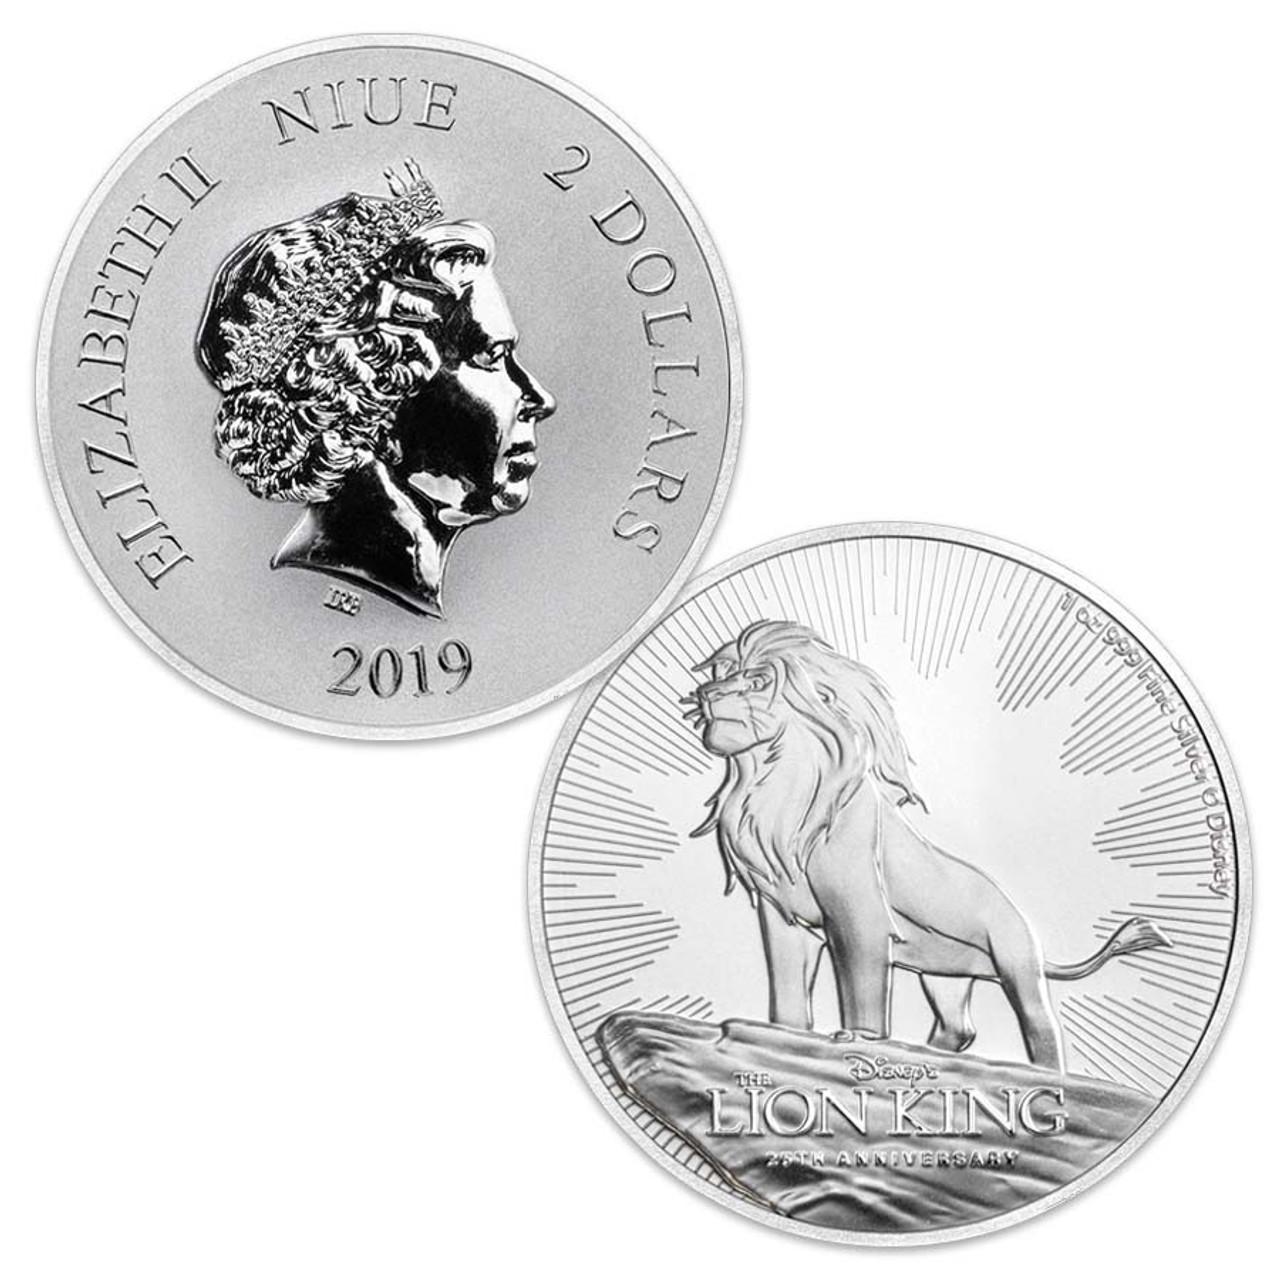 Niue Island 2019 Disney Lion King 25th Anniversary 1-Oz. Silver $2 Brilliant Uncirculated